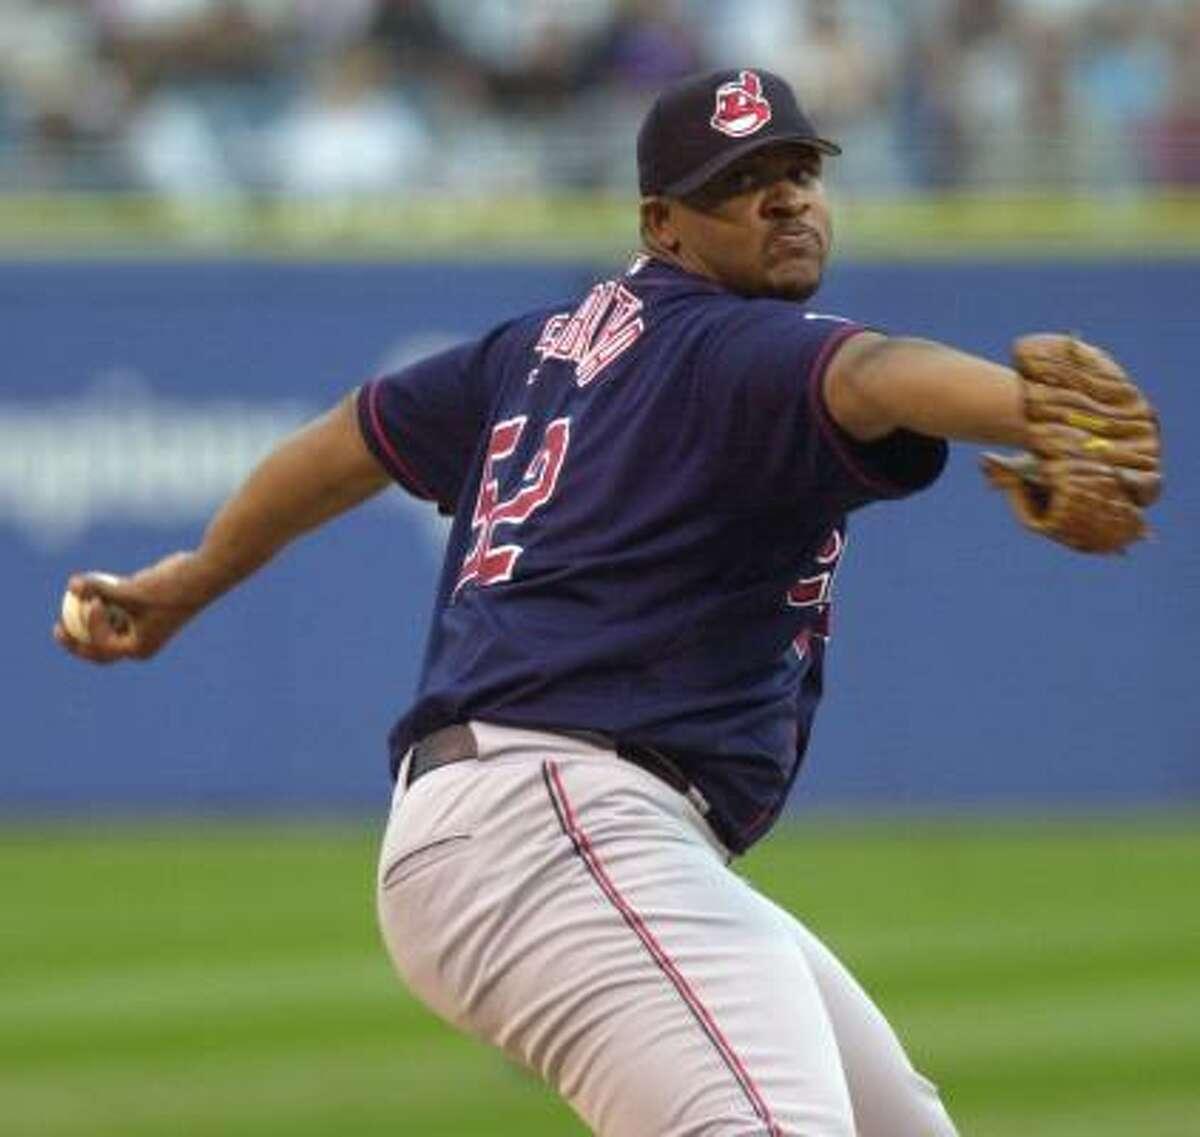 CC Sabathia, Cleveland Indians Year: 2001 W-L: 17-5 ERA: 4.39 Starts: 33 IP: 180.1 BB: 95 Ks: 171